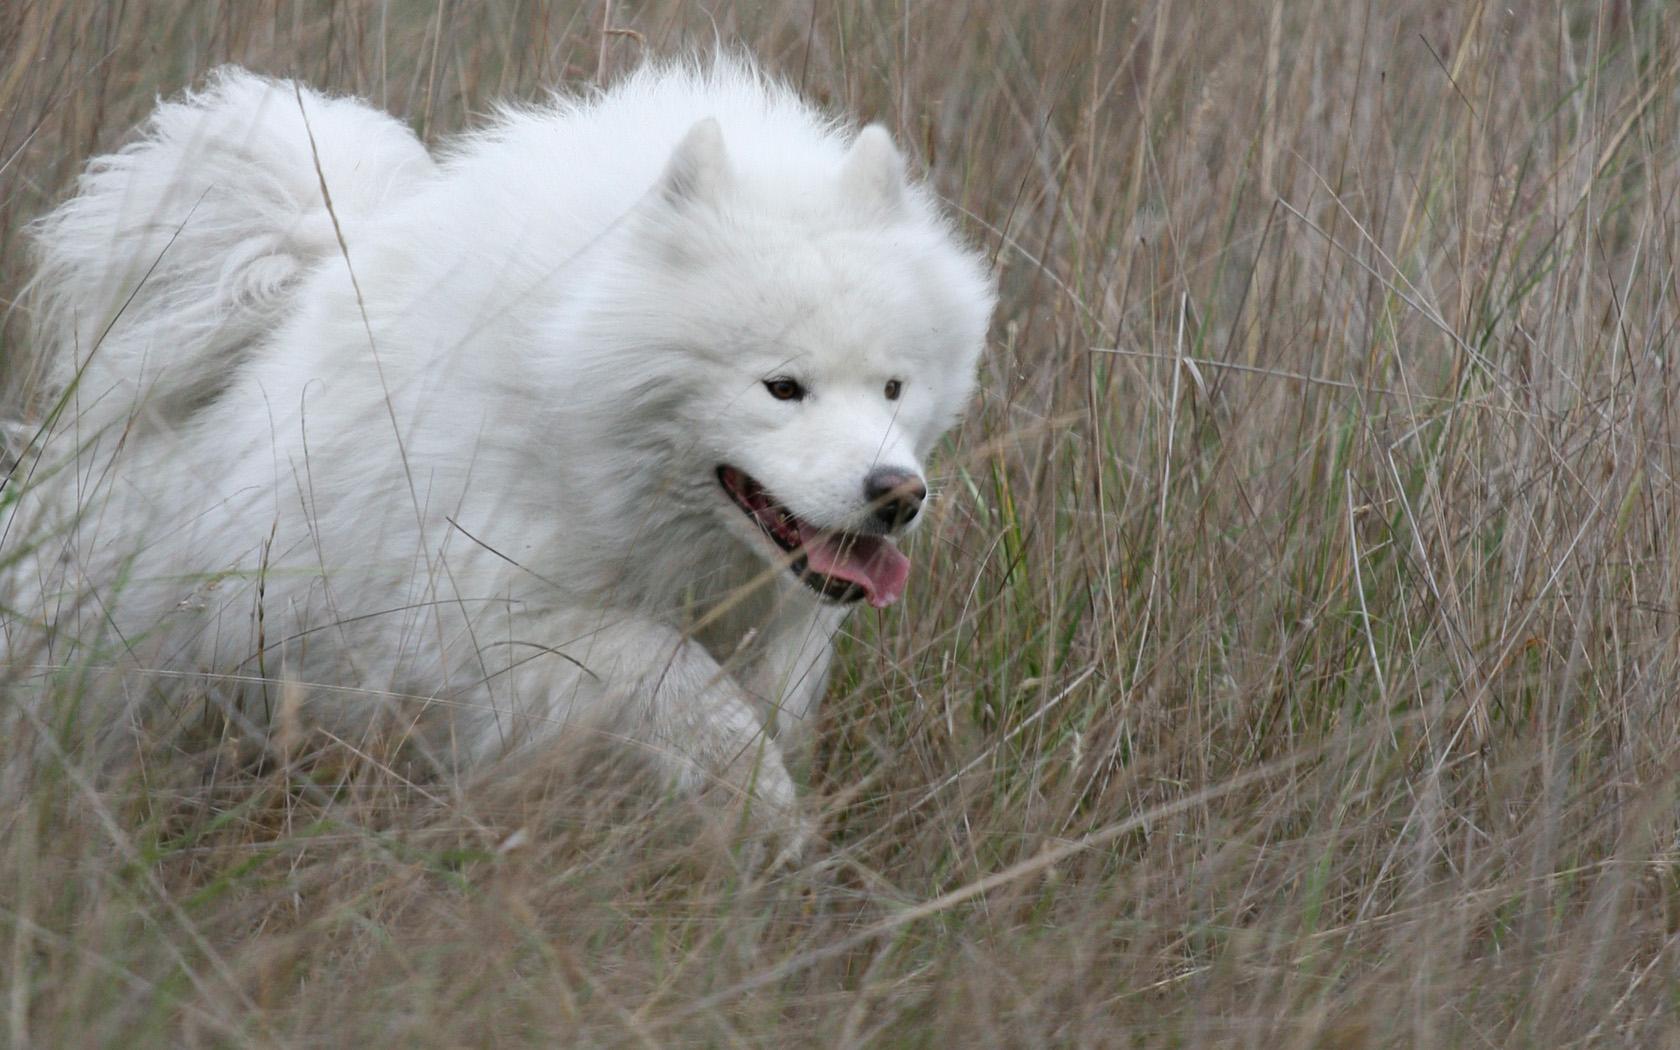 Thrifty Blue S Big Fluffy Dog Images Existence Big Fluffy Dog This Est Dog Breeds bark post Big Fluffy White Dog